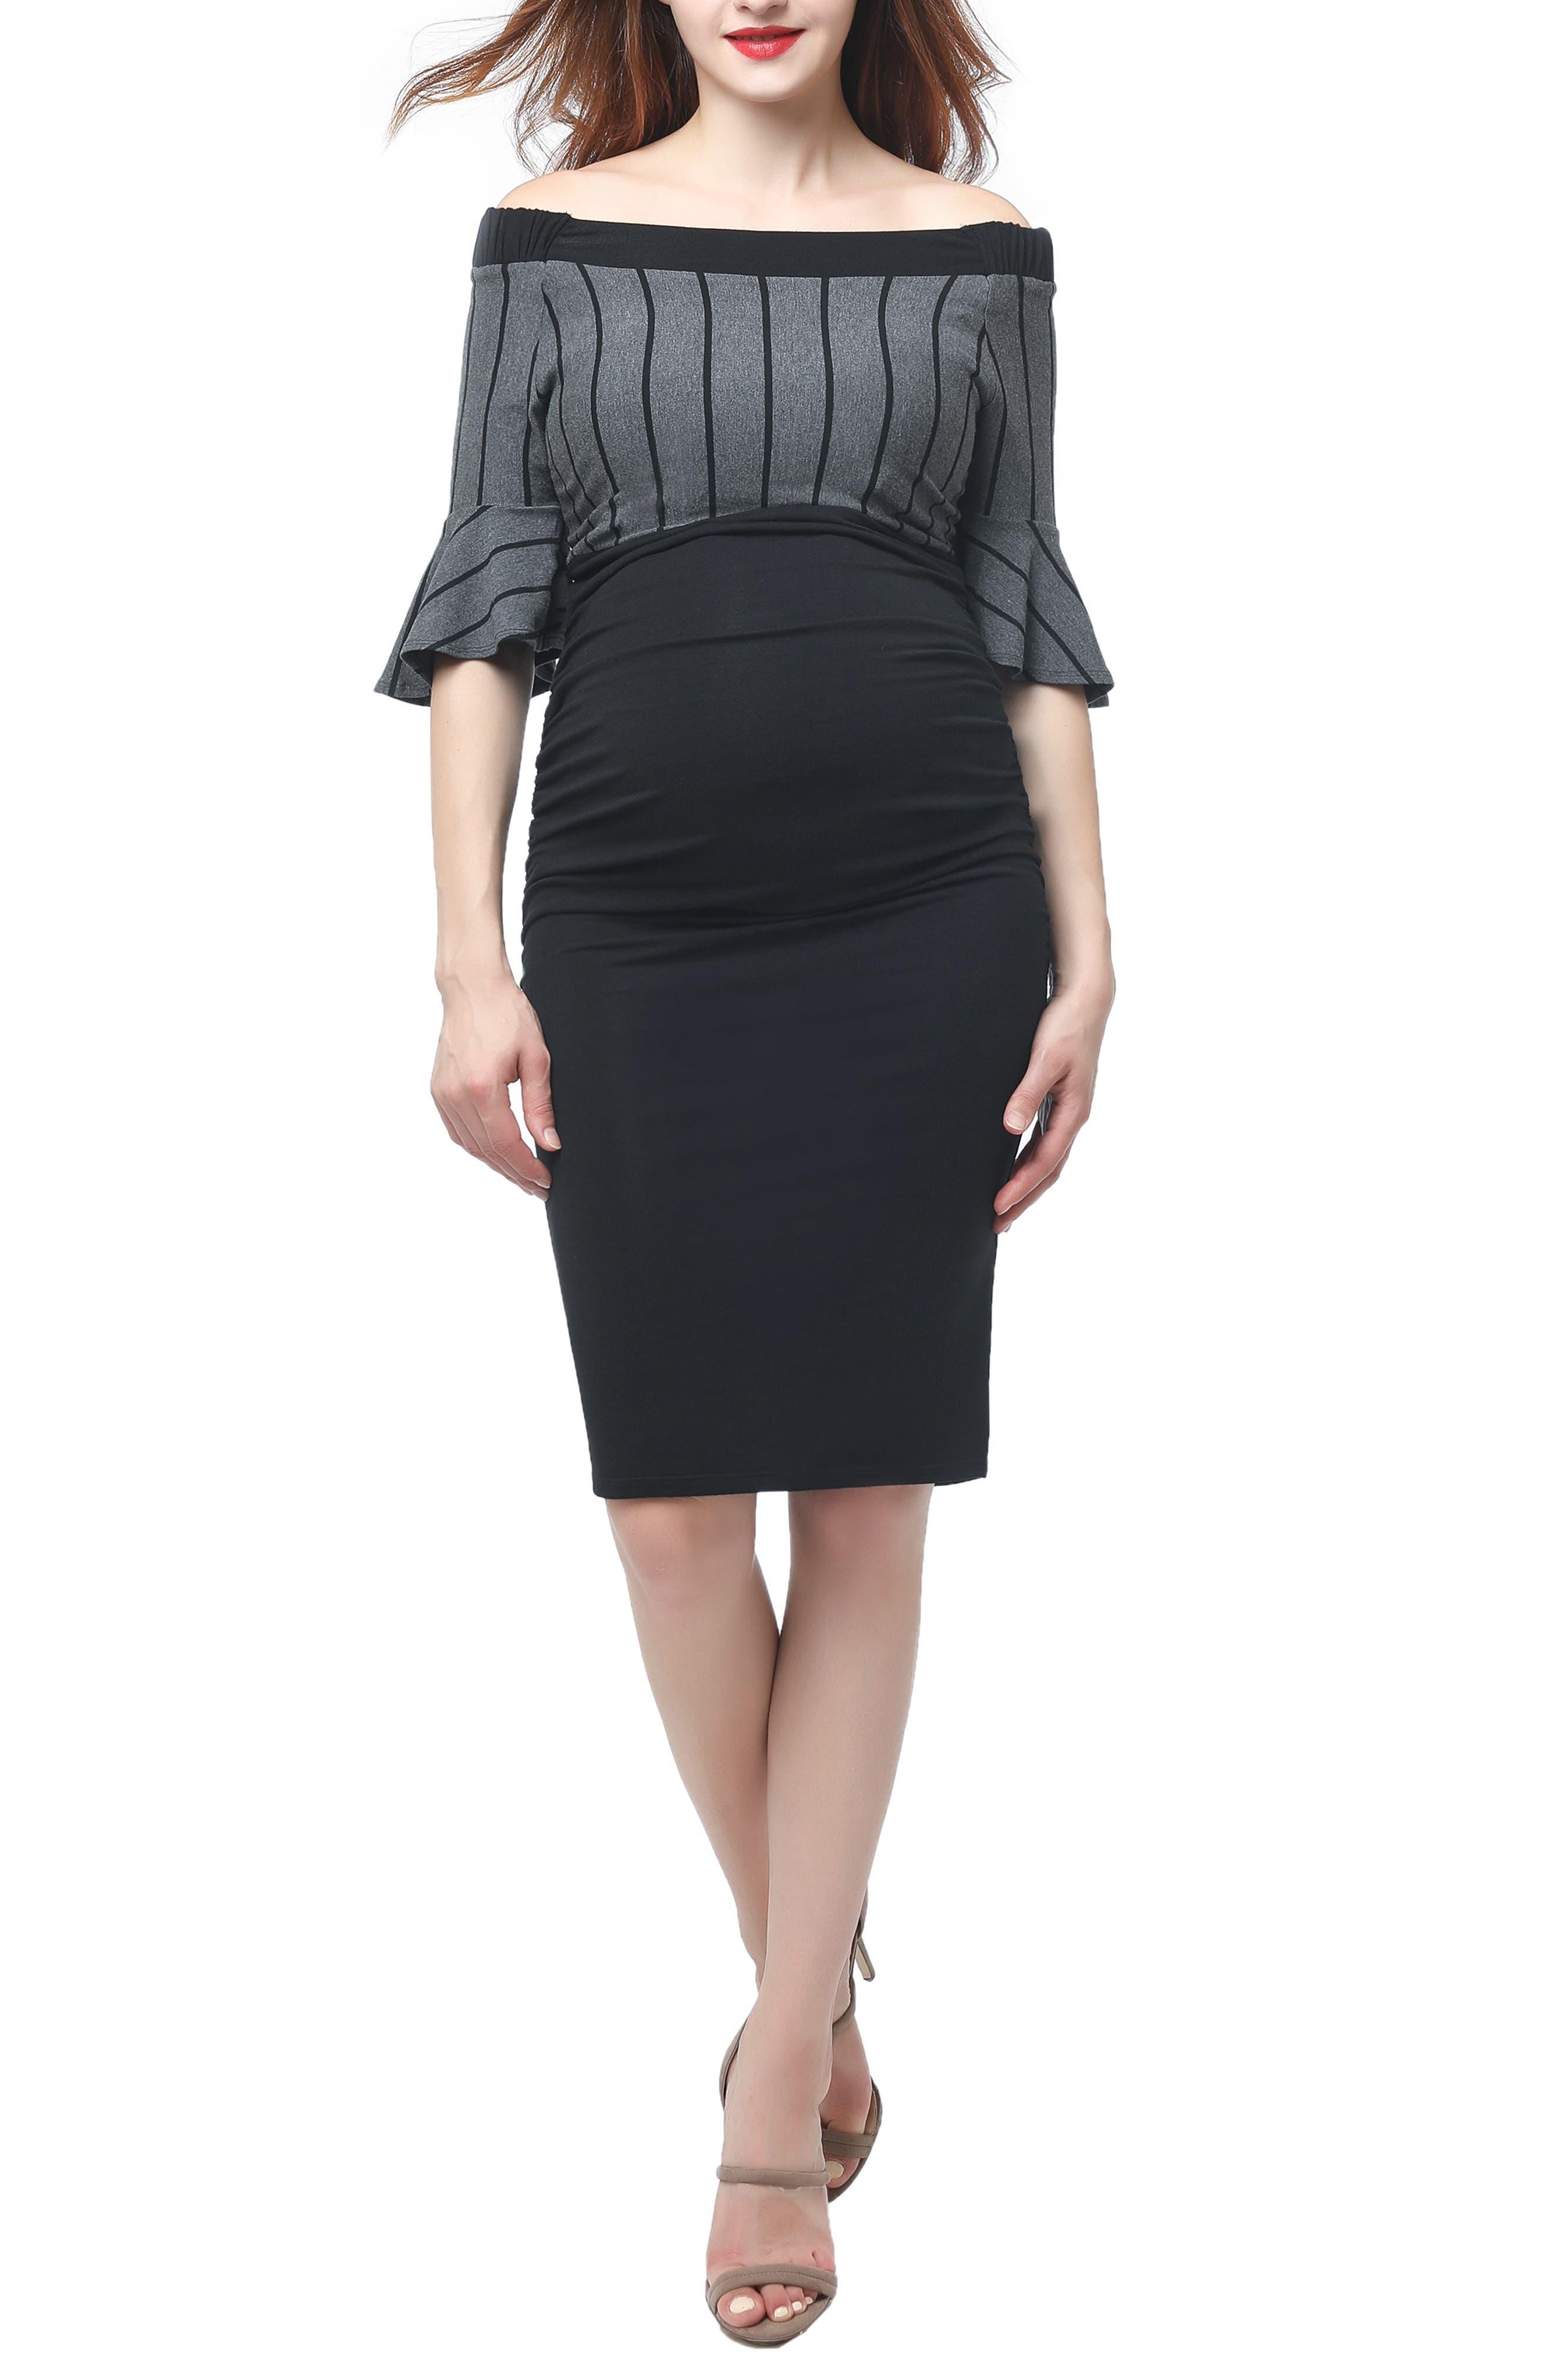 Kimi And Kai Josephine Off The Shoulder Body-Con Maternity Dress